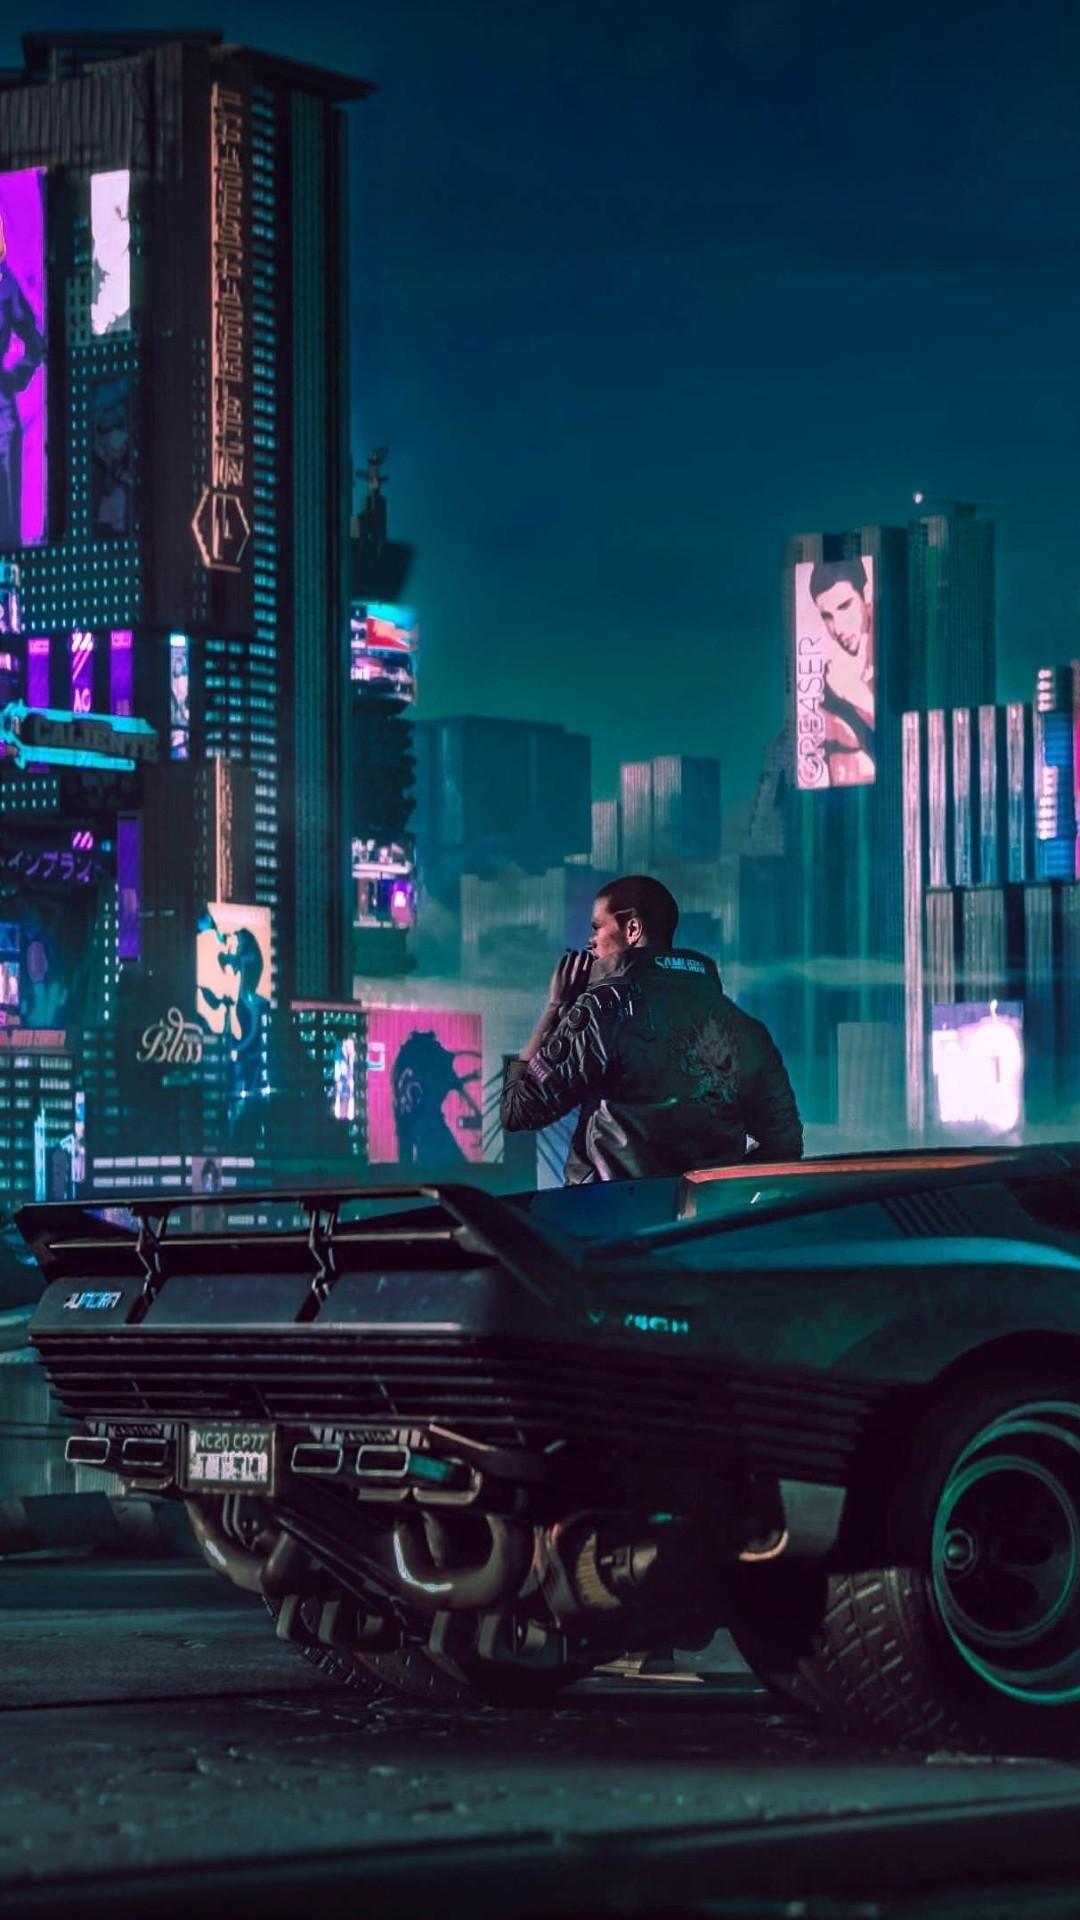 Cyberpunk phone background